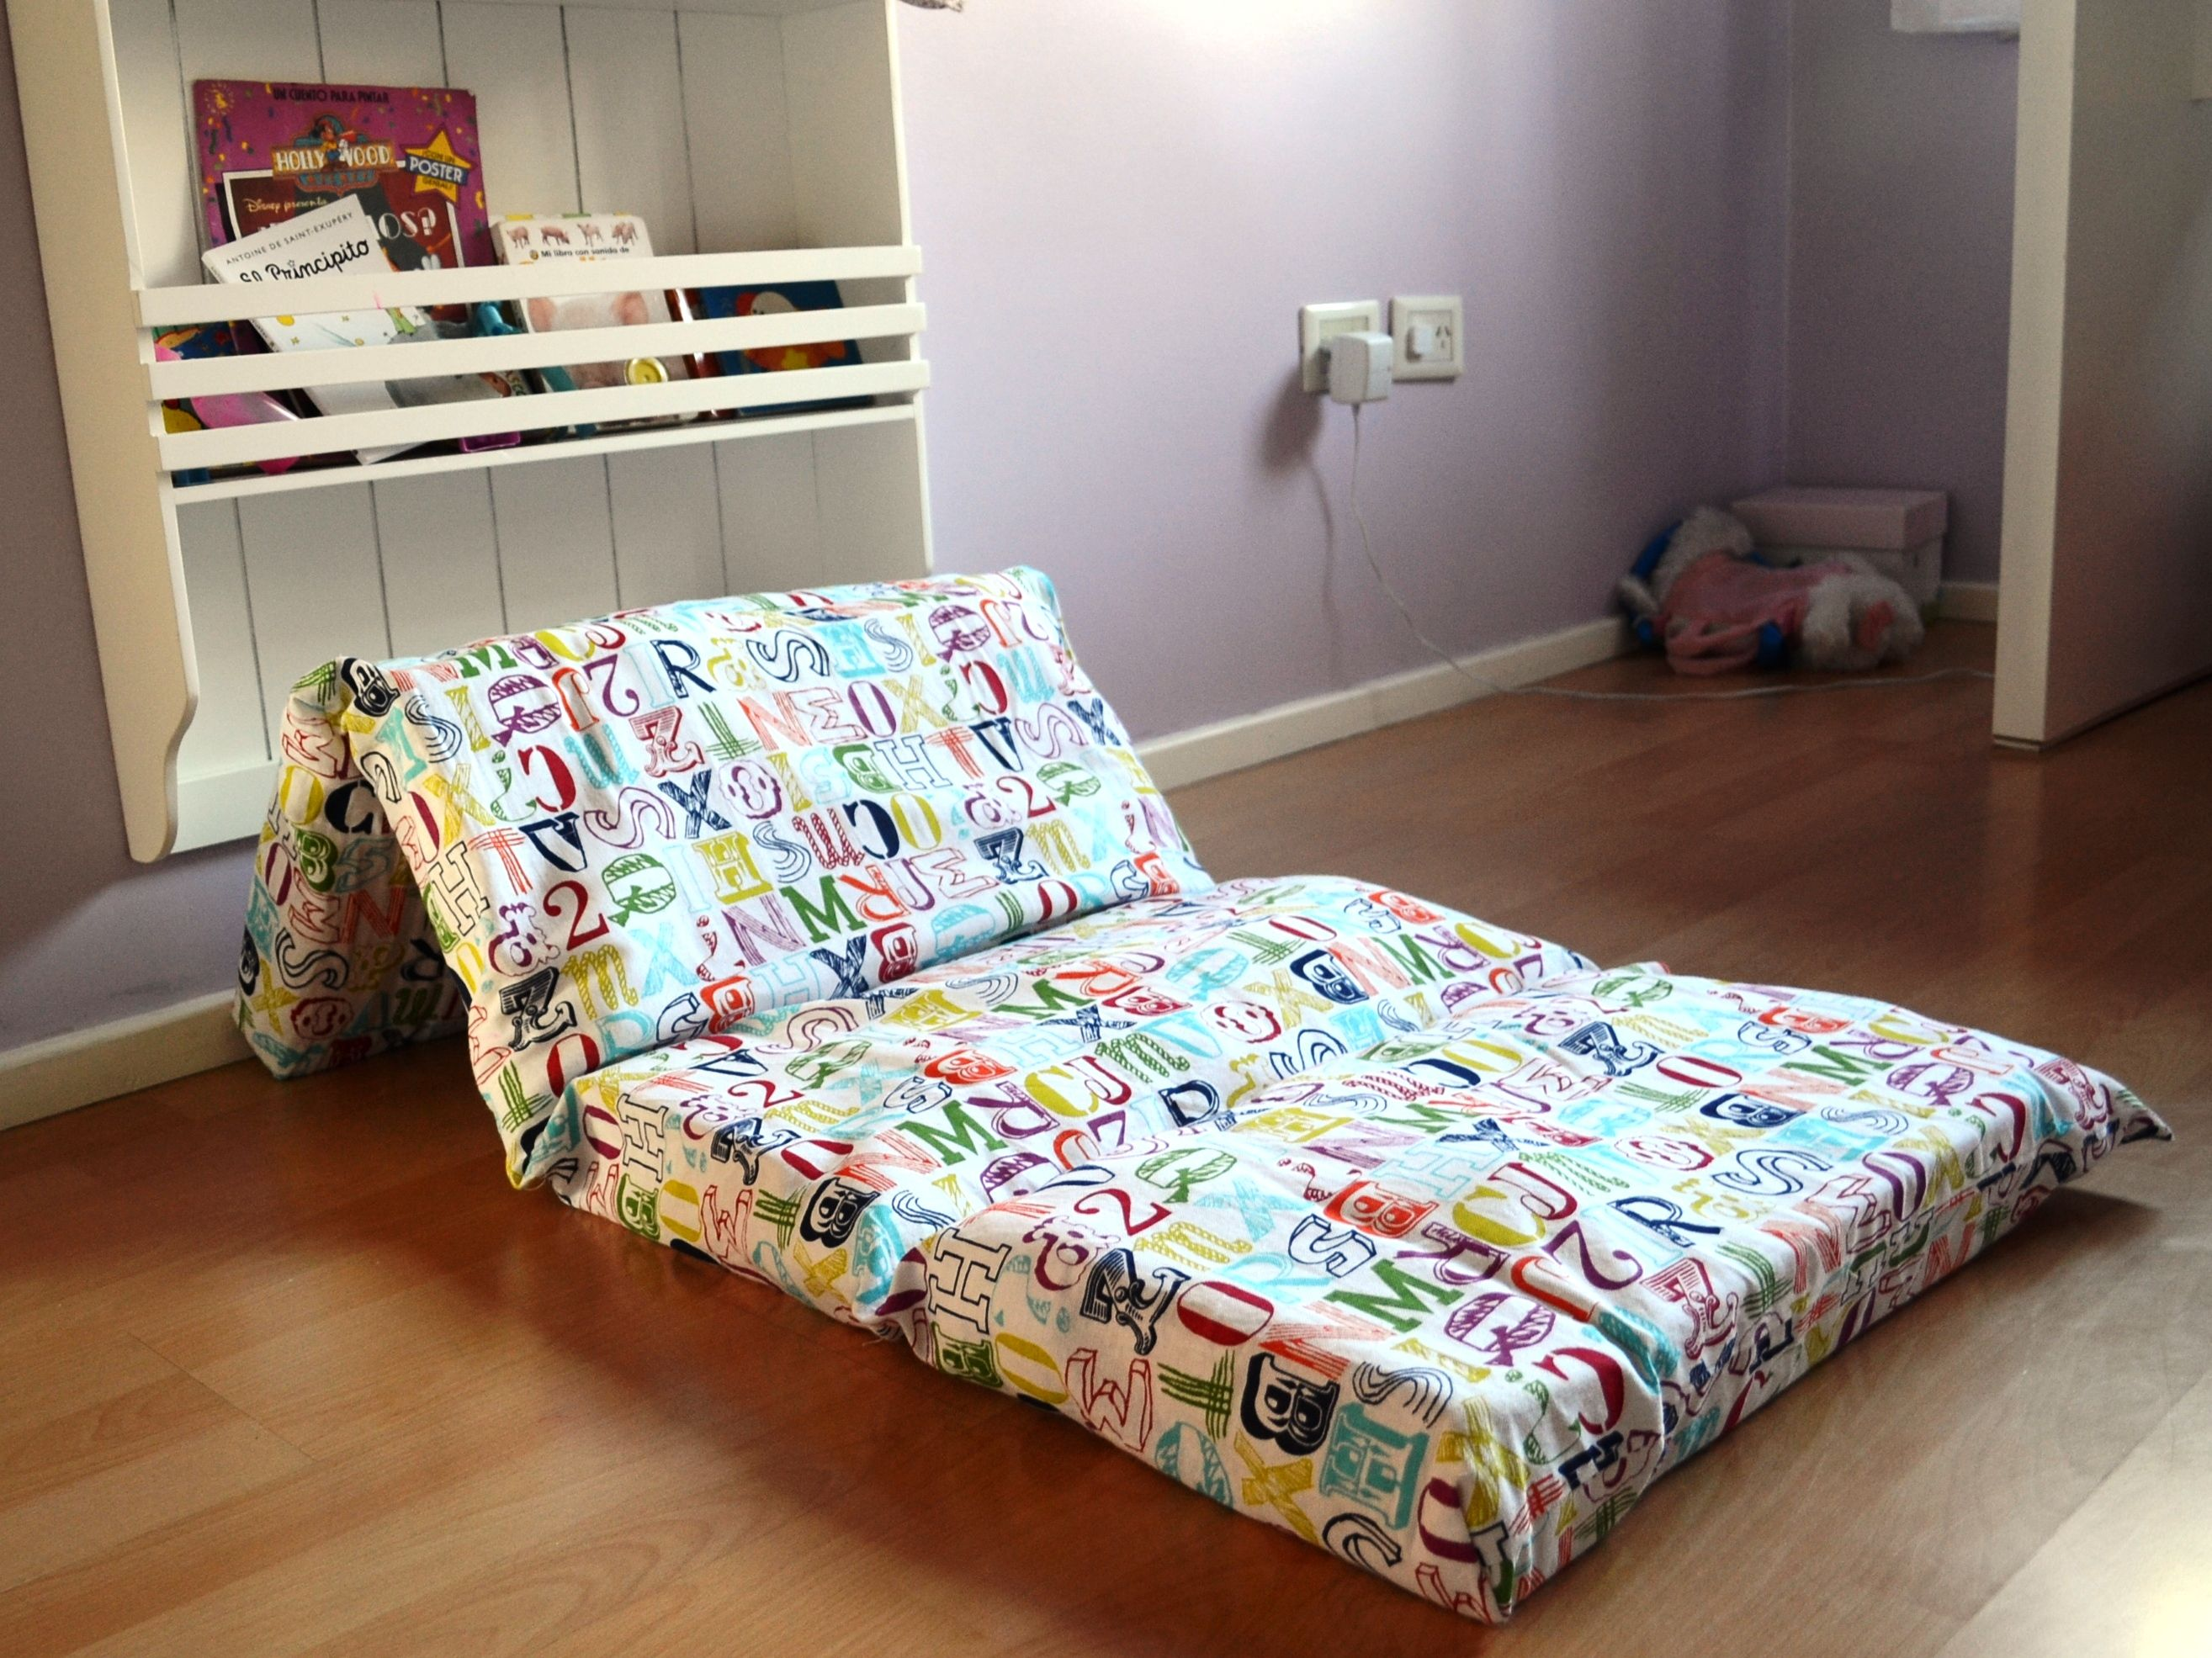 Http Articulo Mercadolibre Com Ar Mla 466060003 Colchoneta  # Muebles De Hule Espuma Para Ninos